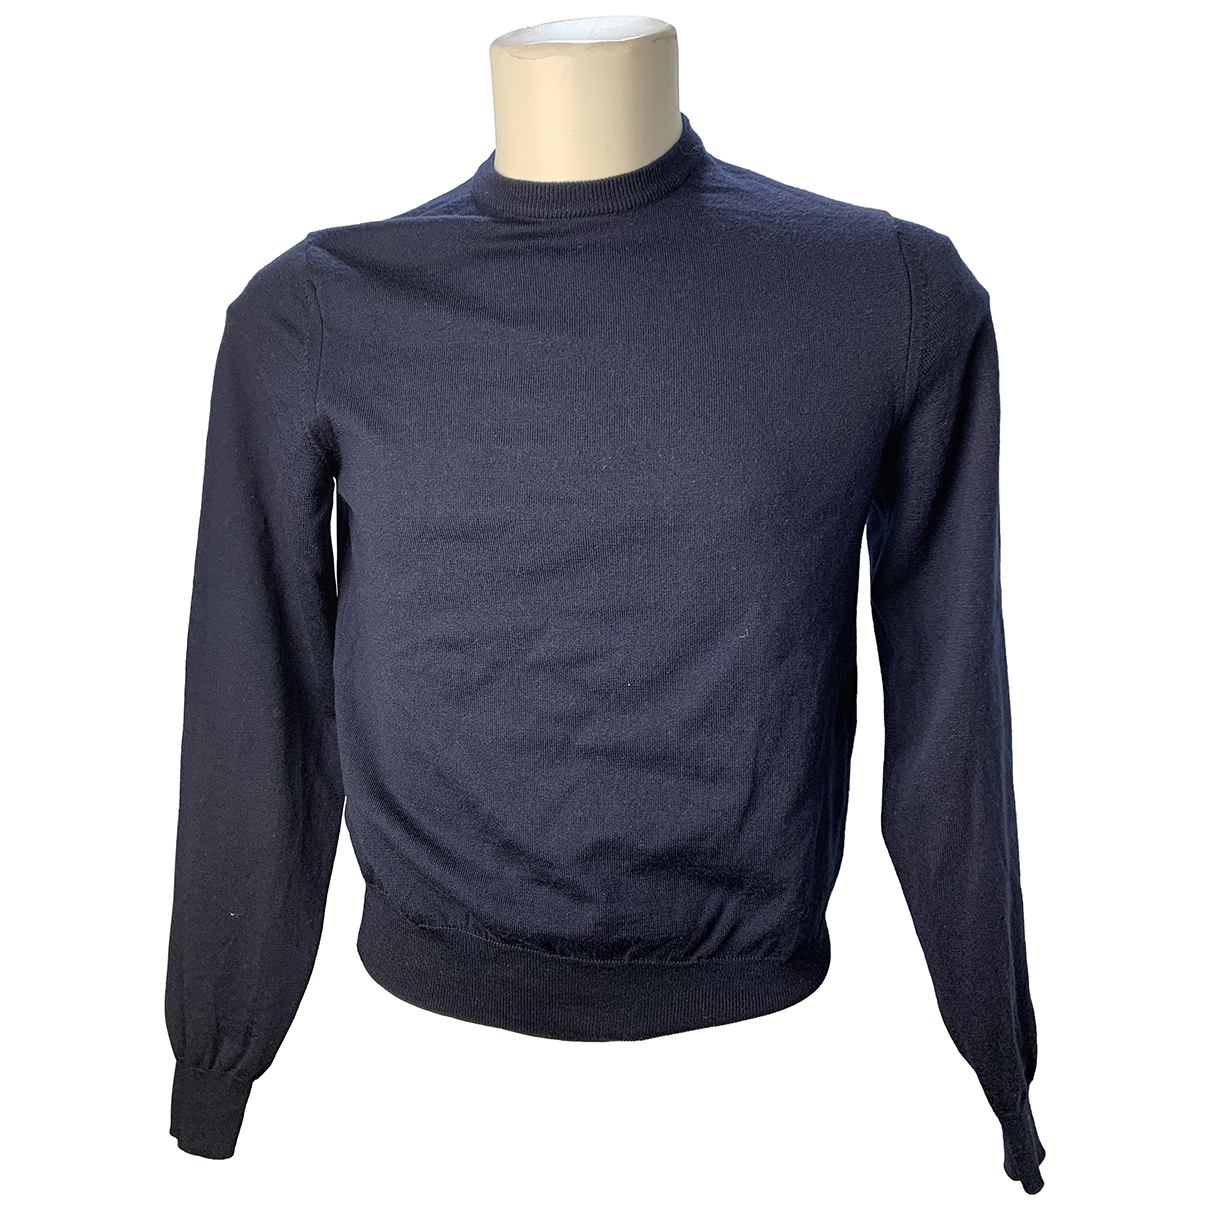 Just Cavalli \N Blue Wool Knitwear & Sweatshirts for Men S International